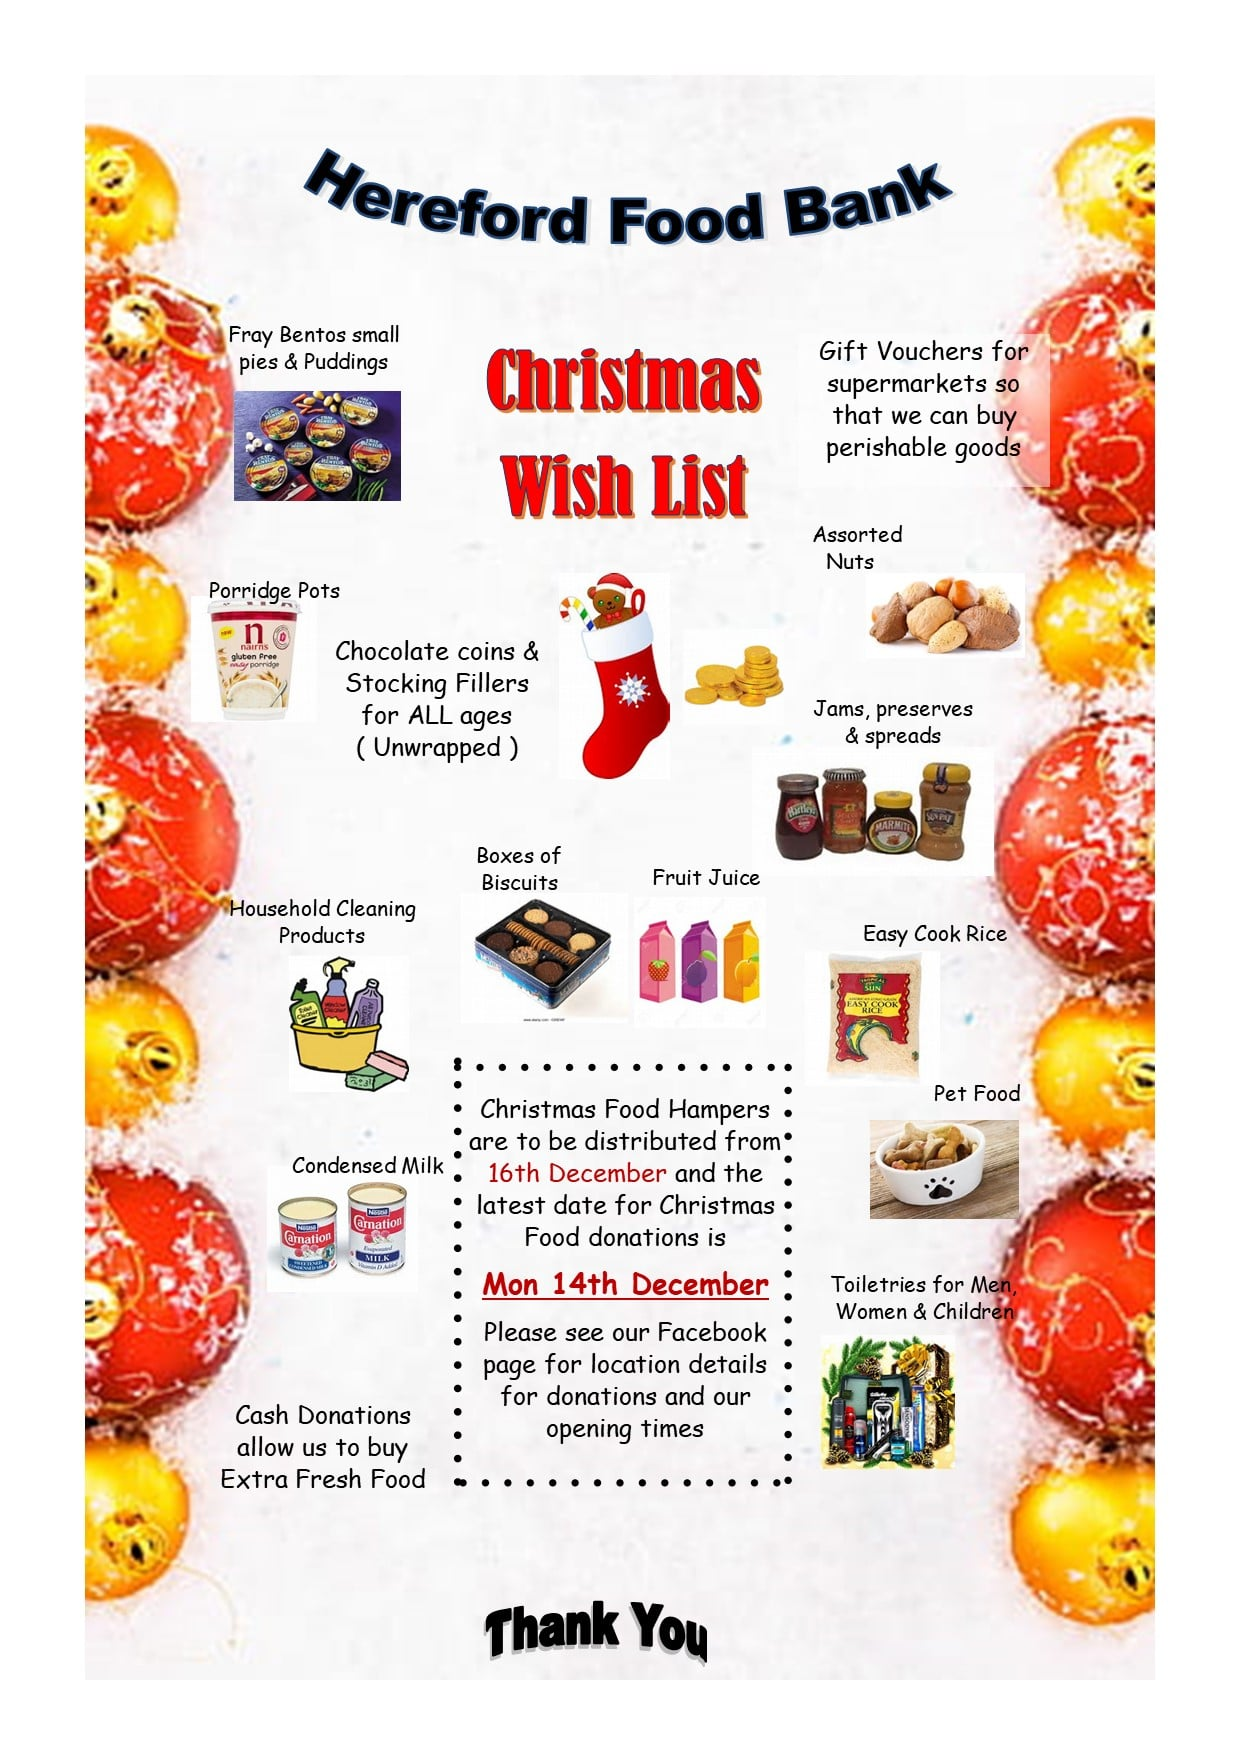 Hereford Food Bank Christmas Appeal